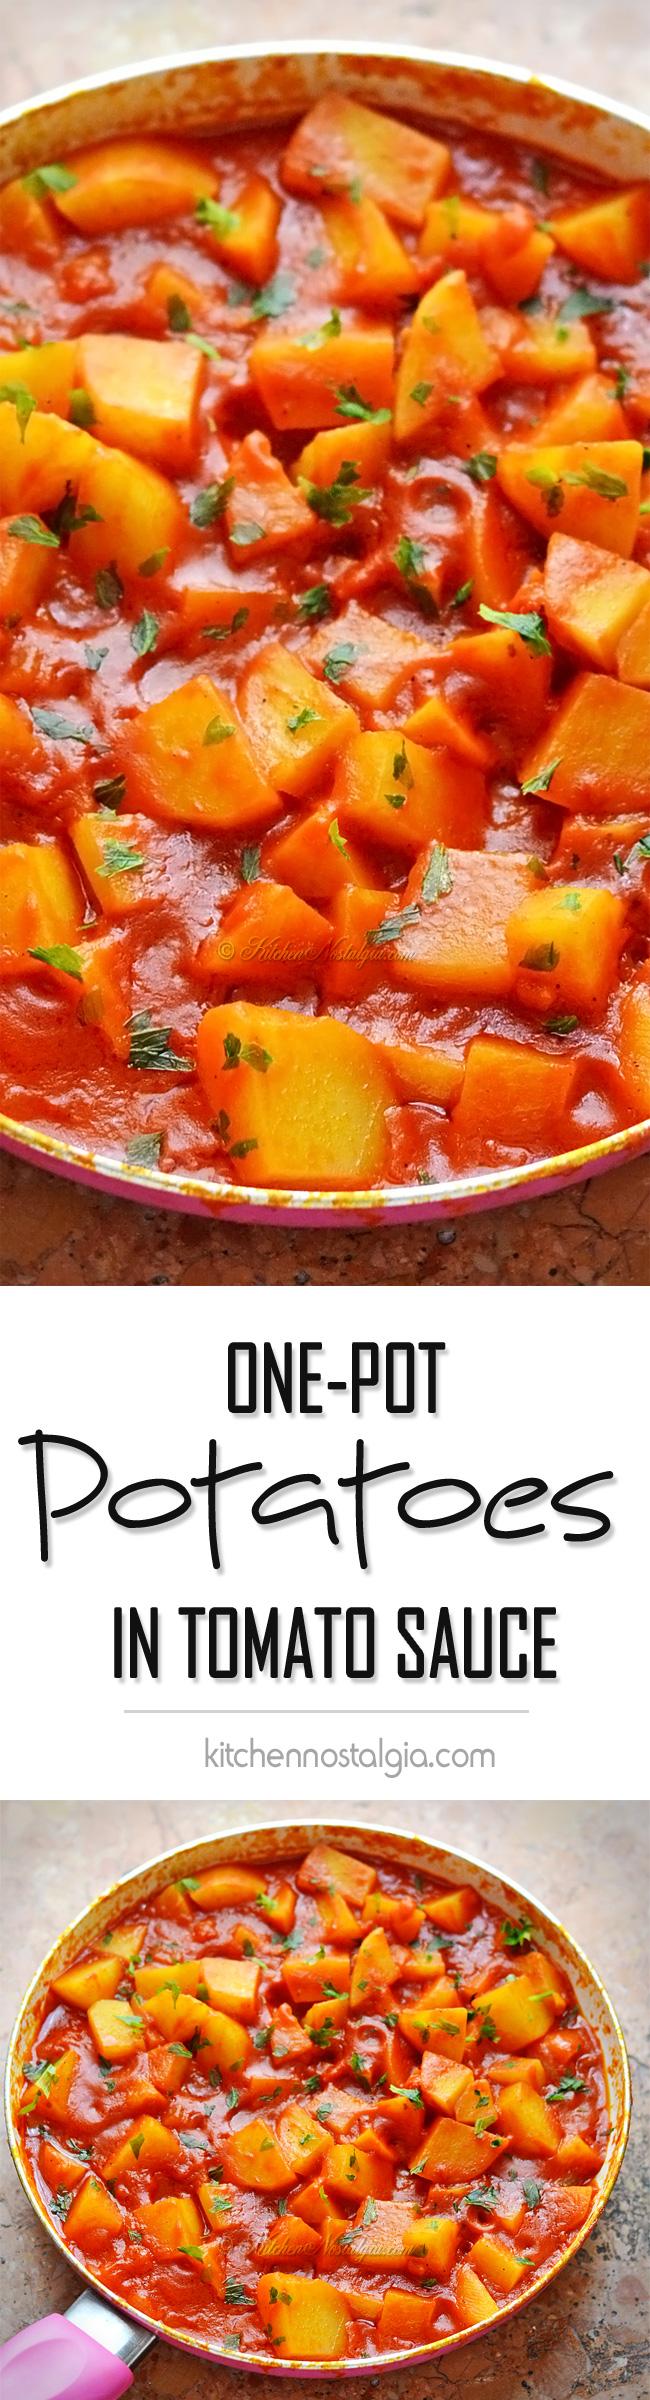 Potatoes in Tomato Sauce - kitchennostalgia.com